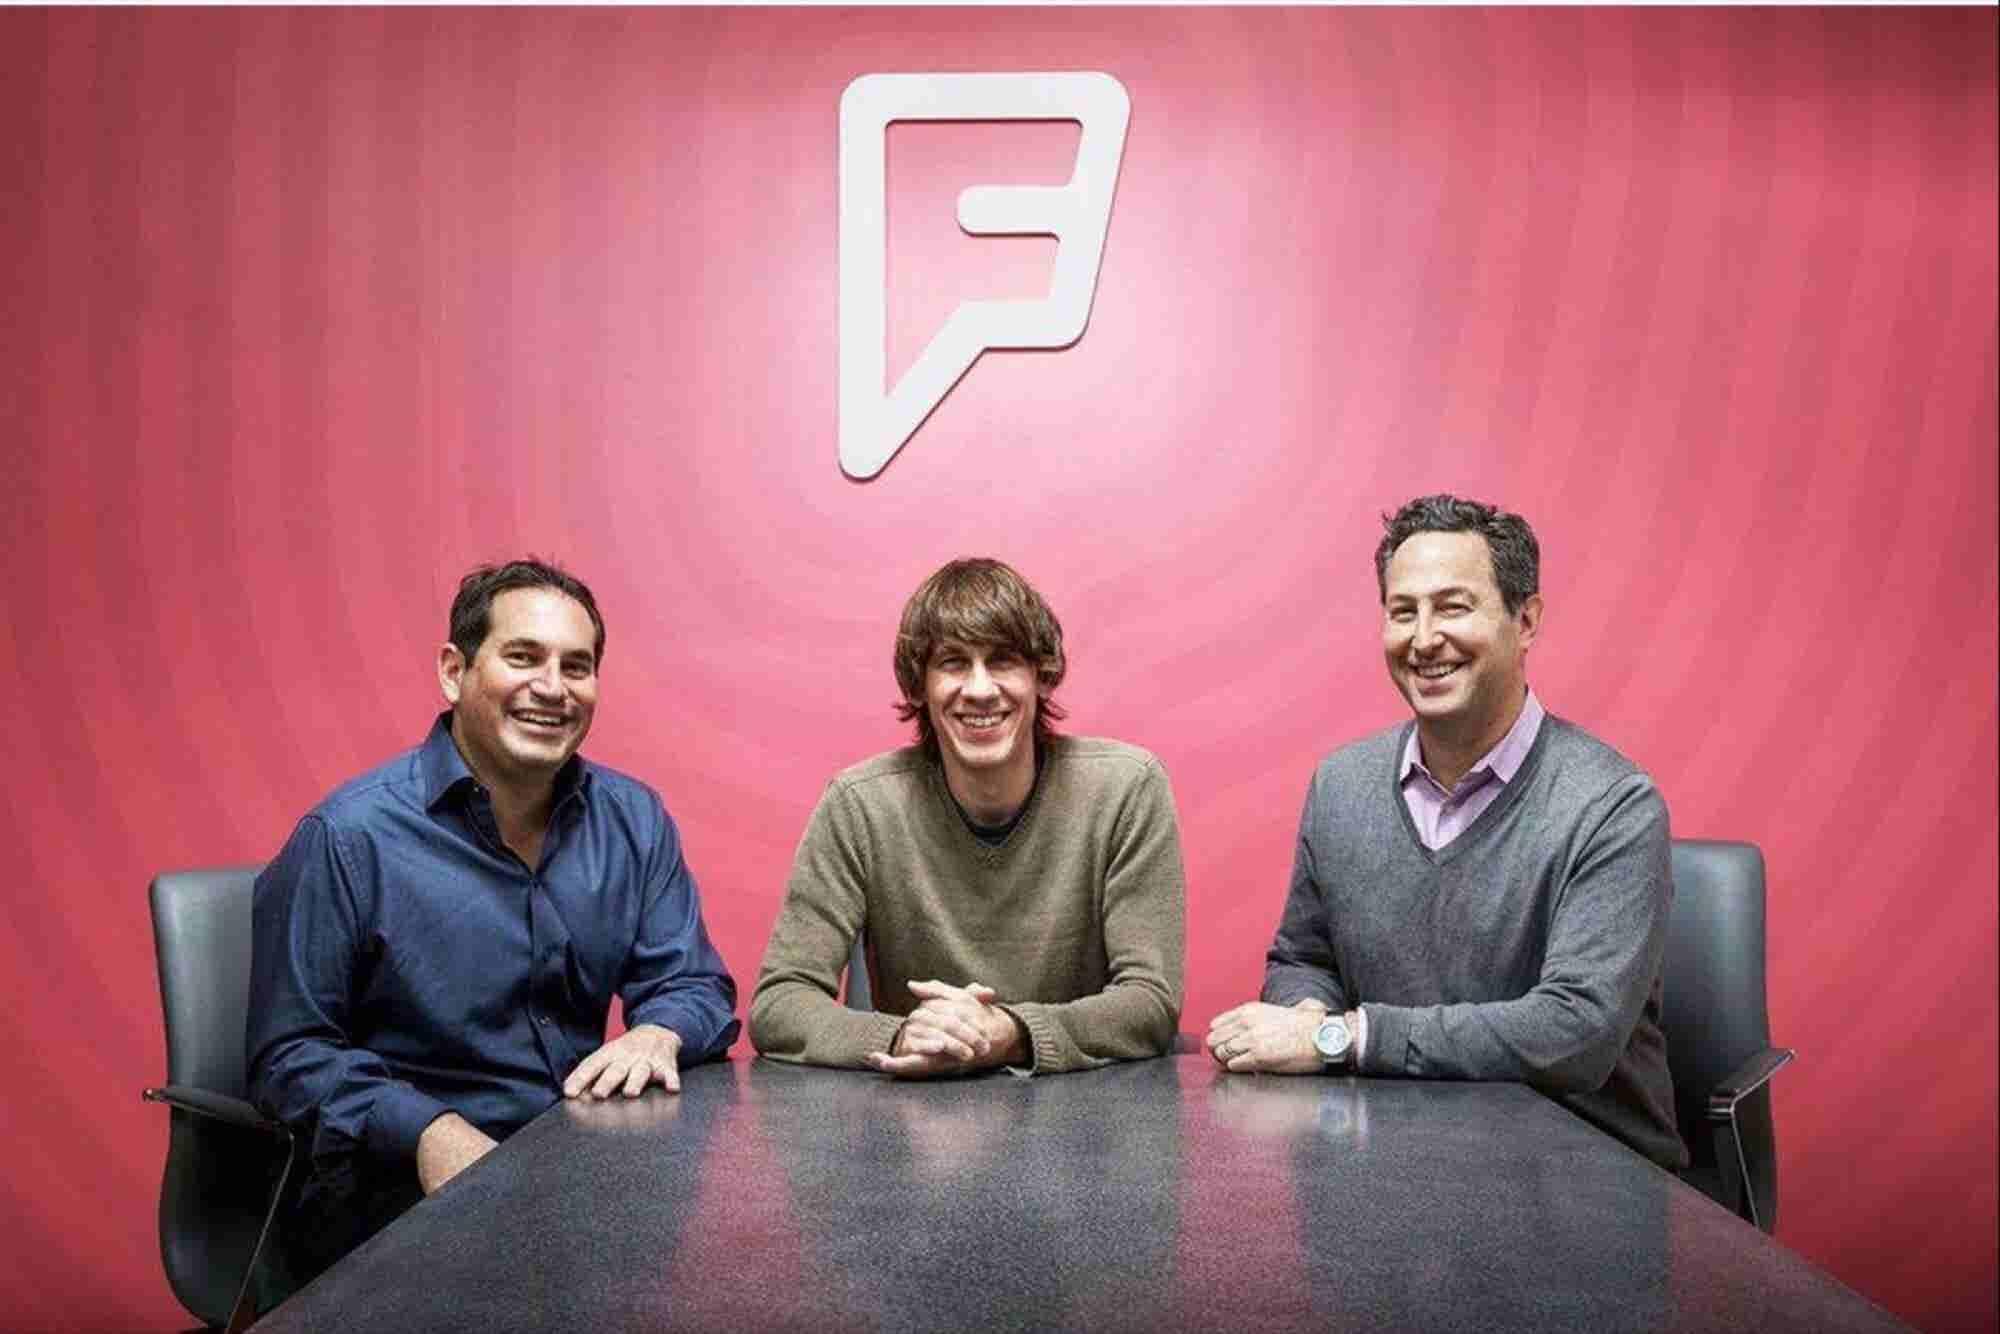 Foursquare Raises $45 Million and Gets New CEO